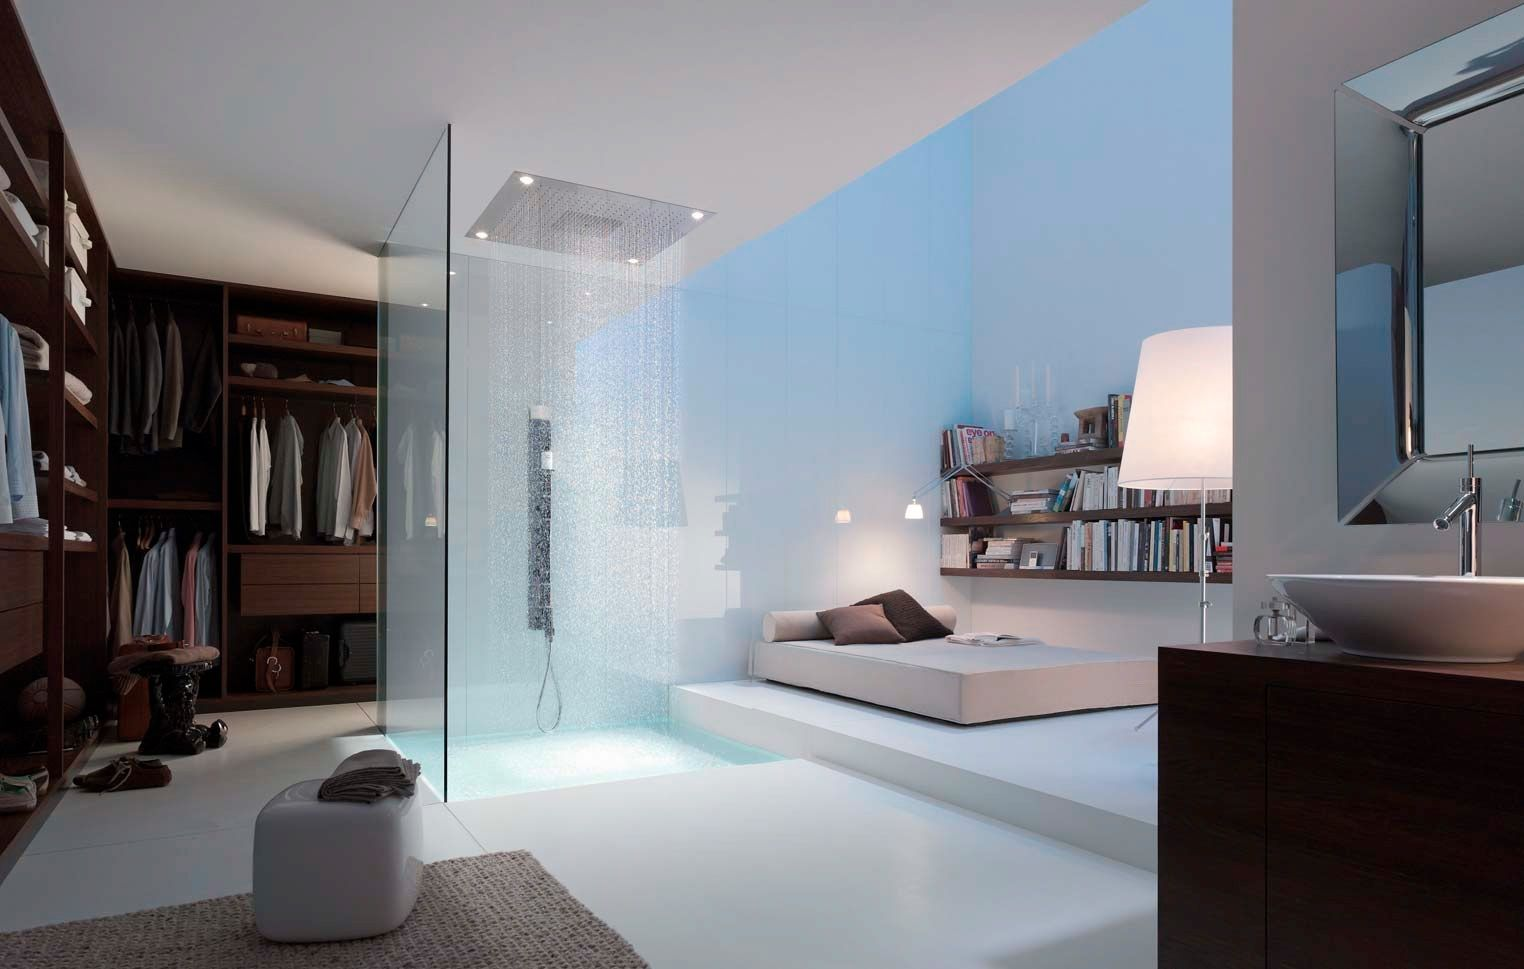 Luxury master bedroom plan  Bathroom Appealing Open Plan Master Bedroom Ultra Modern Ultra